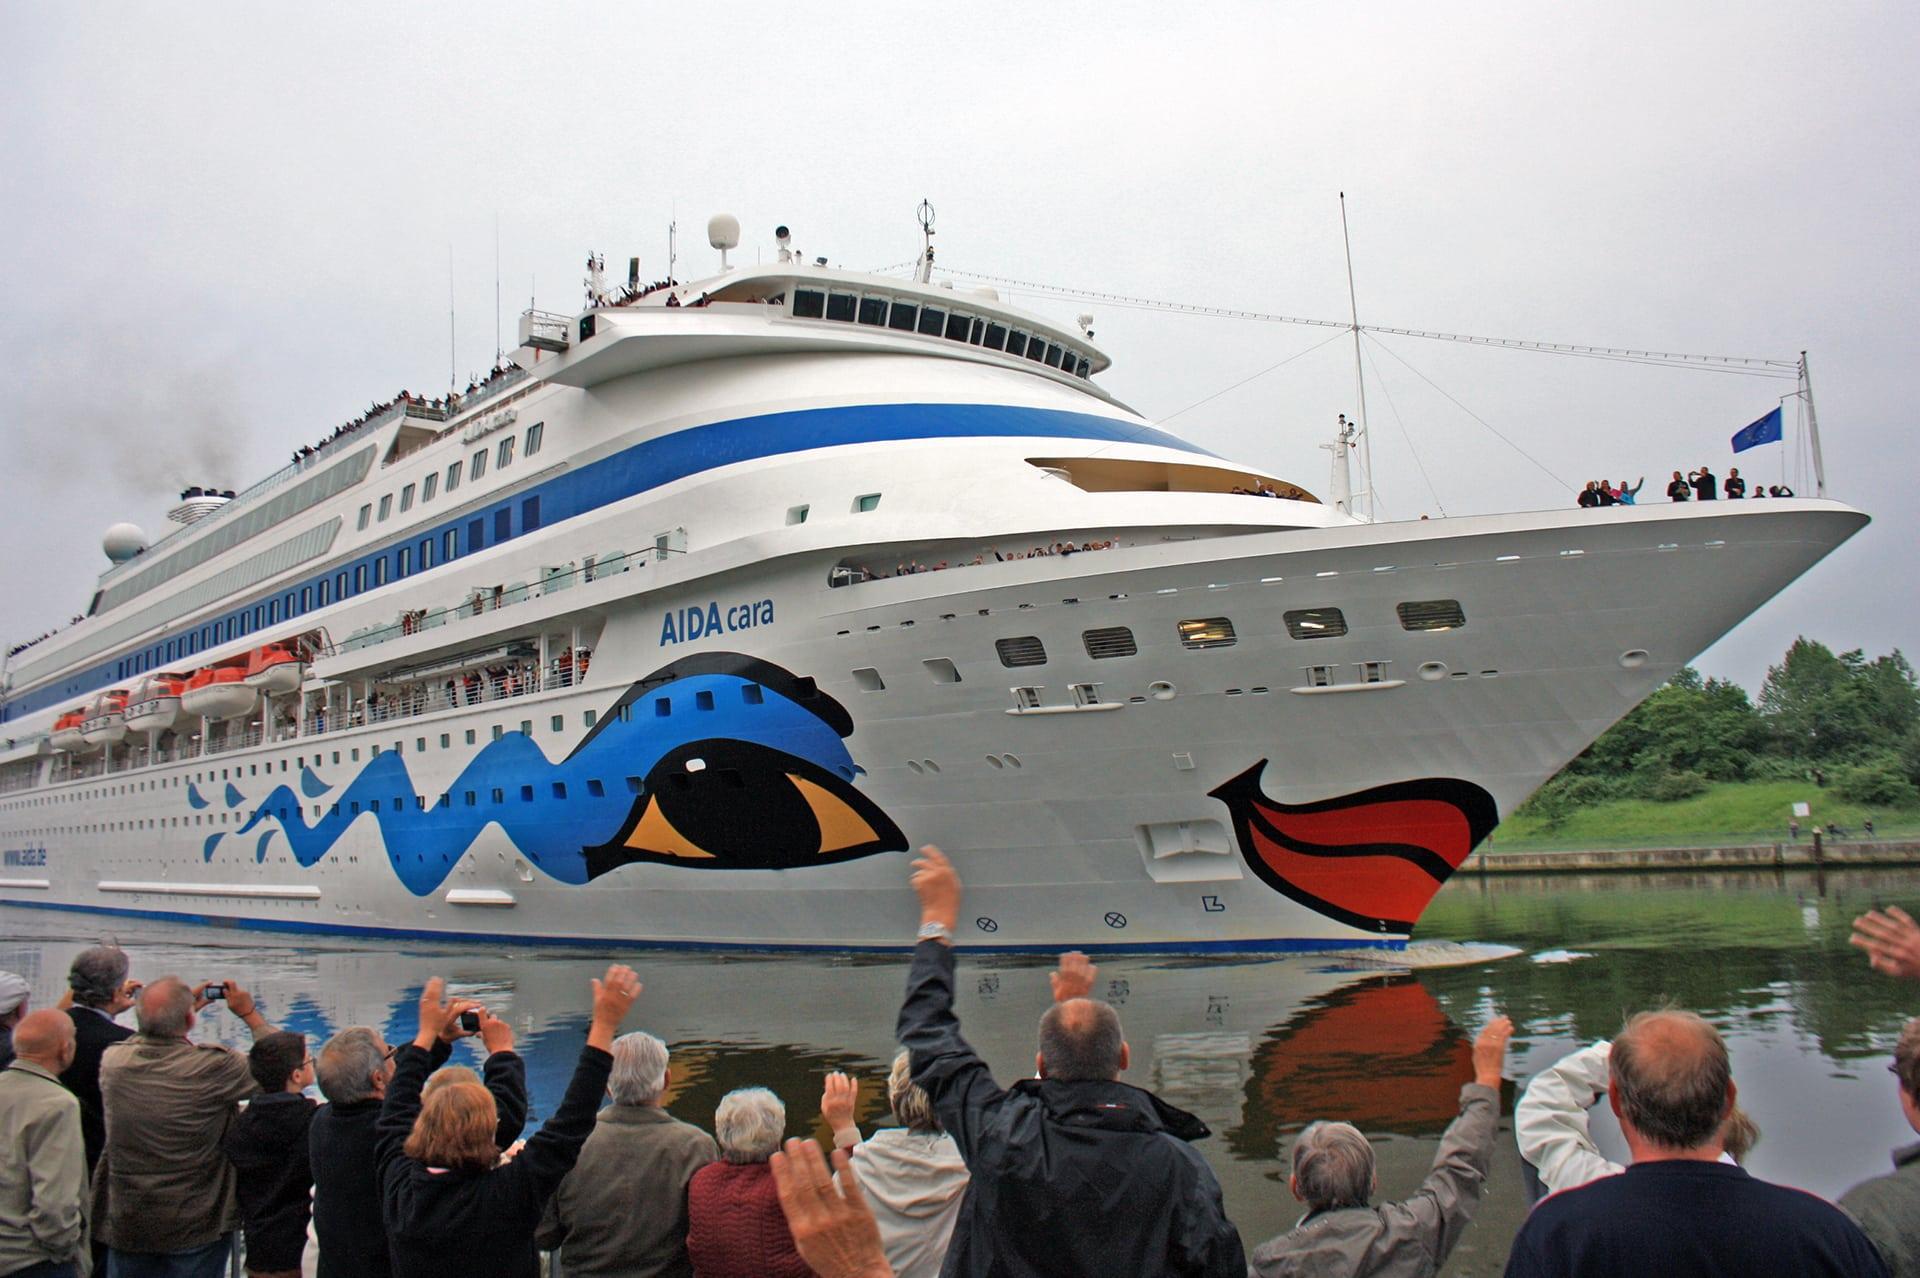 Die AIDA Cara im Nord-Ostsee-Kanal